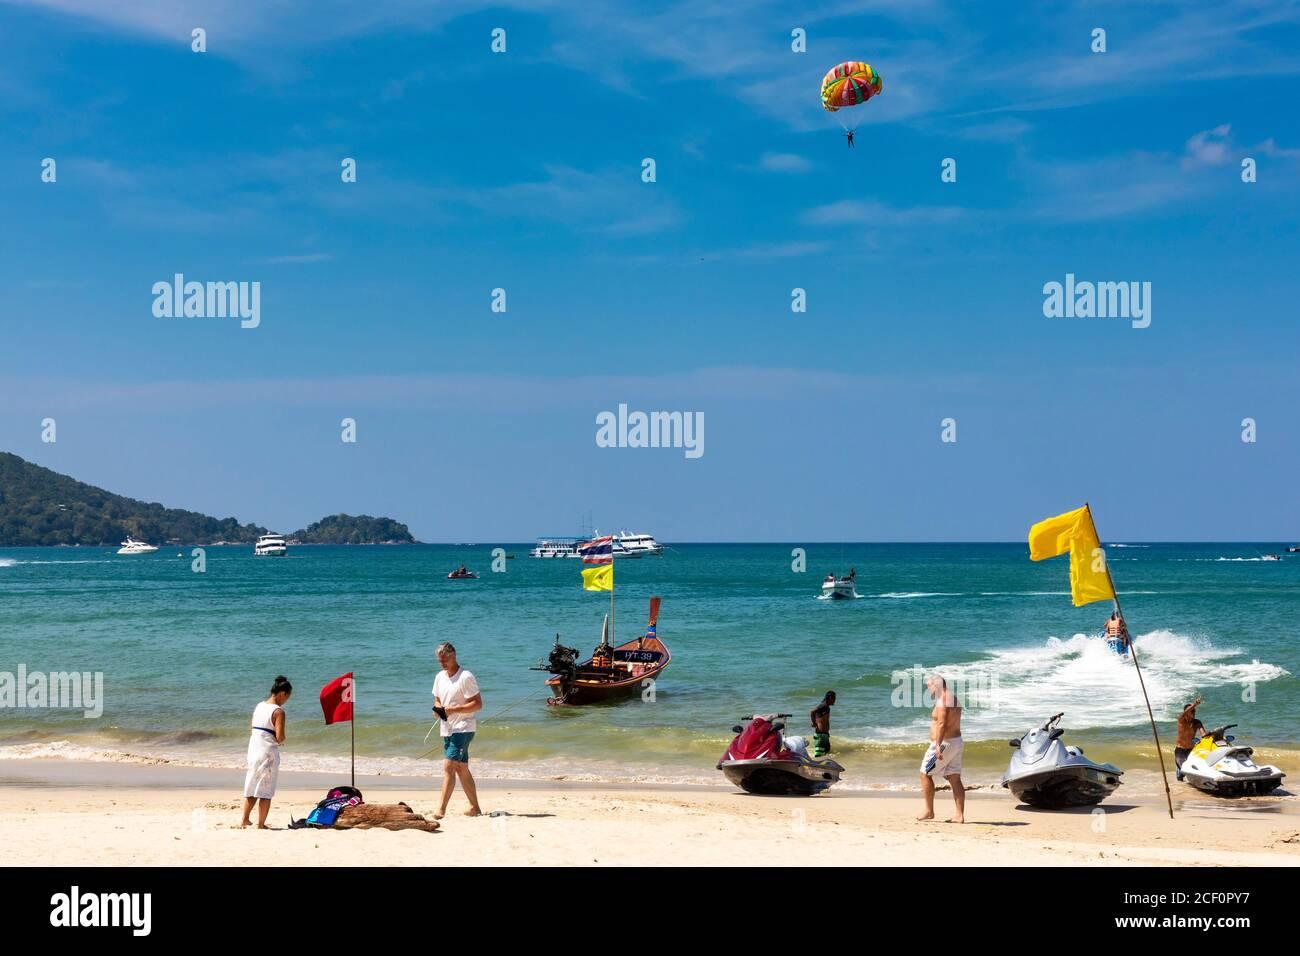 Parasailing über dem Meer, Patong Beach, Phuket, Thailand Stockfoto